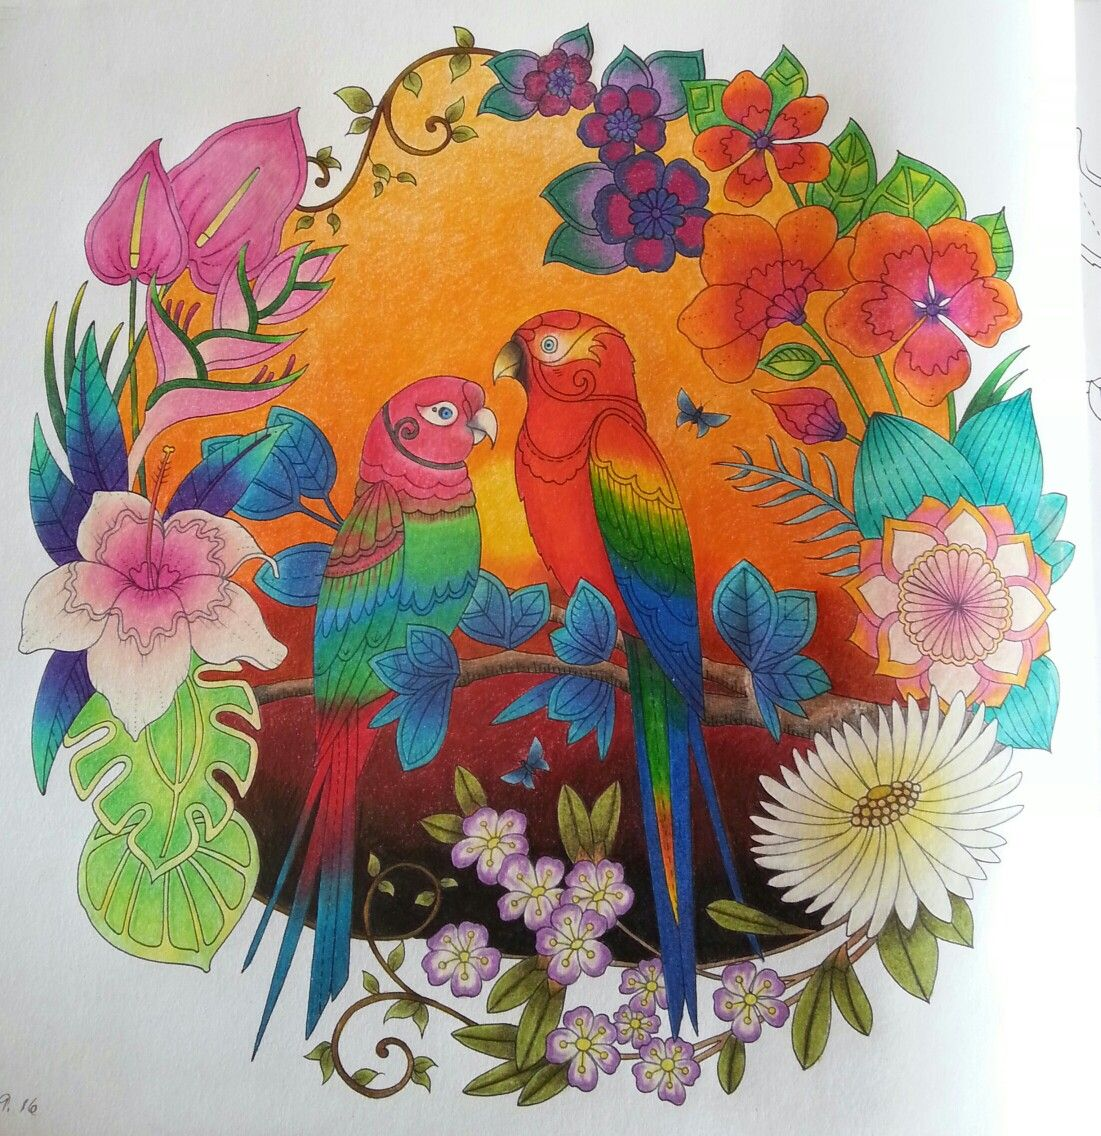 Watercolor pencils for adult coloring book - Johanna Basford Magical Jungle Watercolor Pencilswatercolorsadult Coloringcoloring Bookscolor